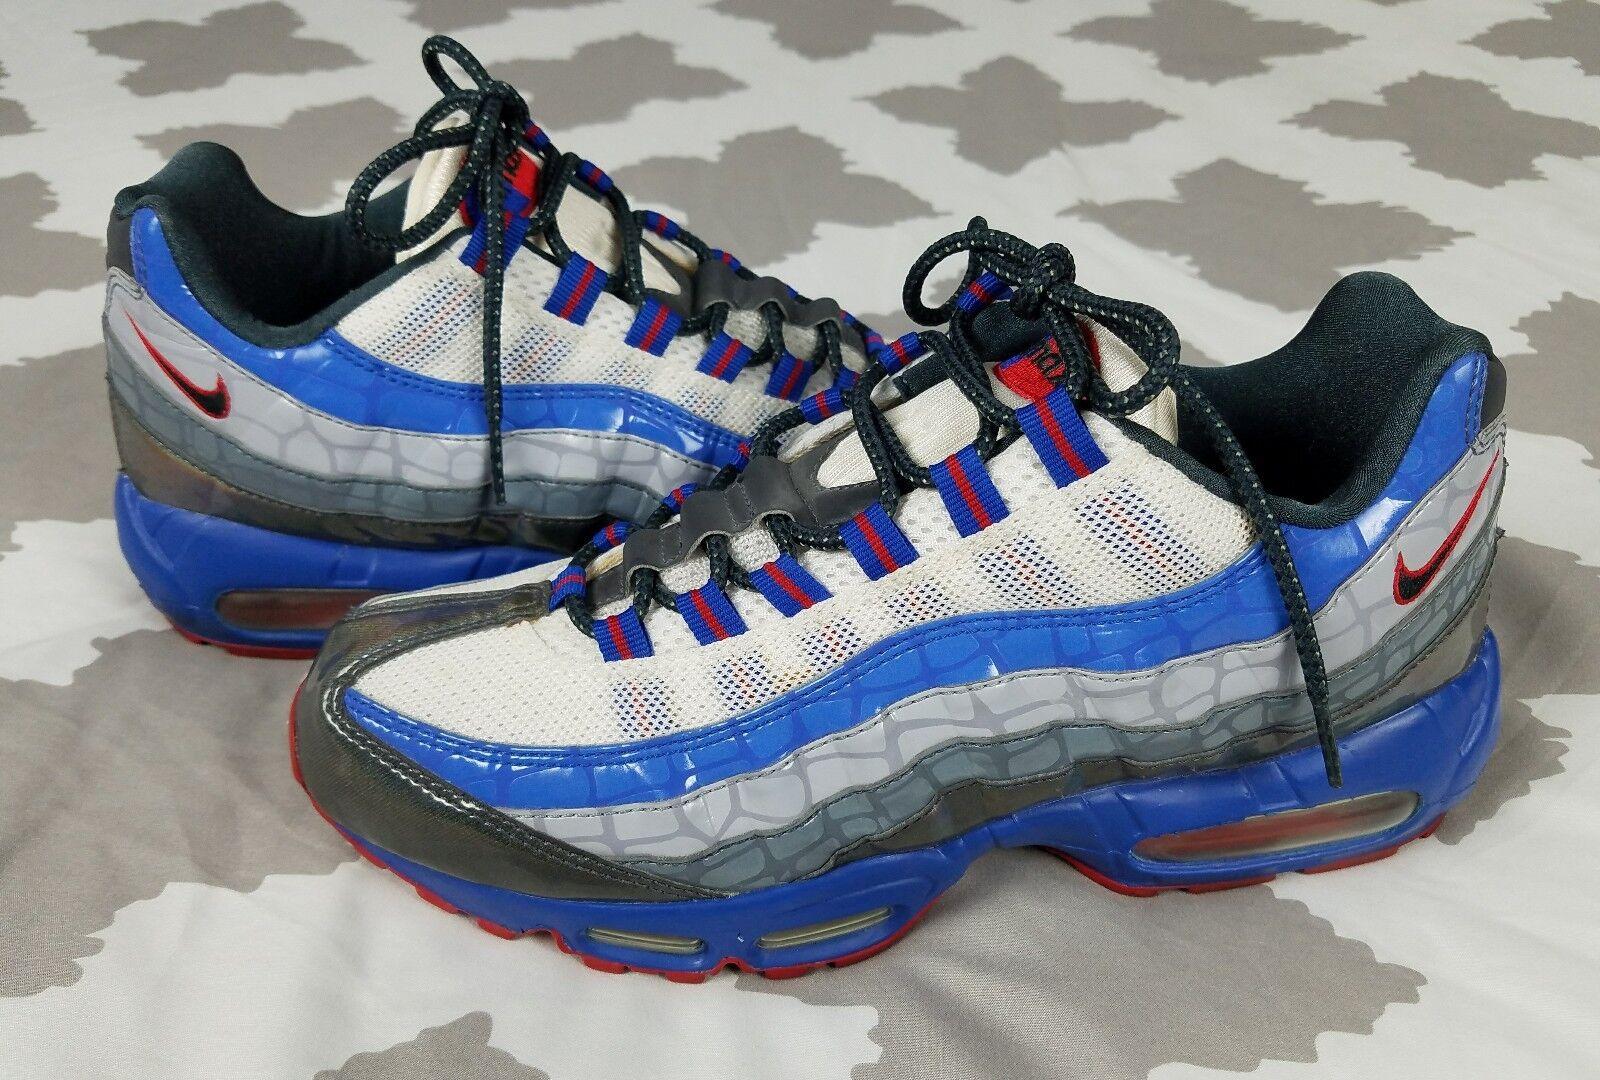 Nike Air Max 95 Transformers 2007 Uomo sz 9 Running Shoes 3m Alligator Print